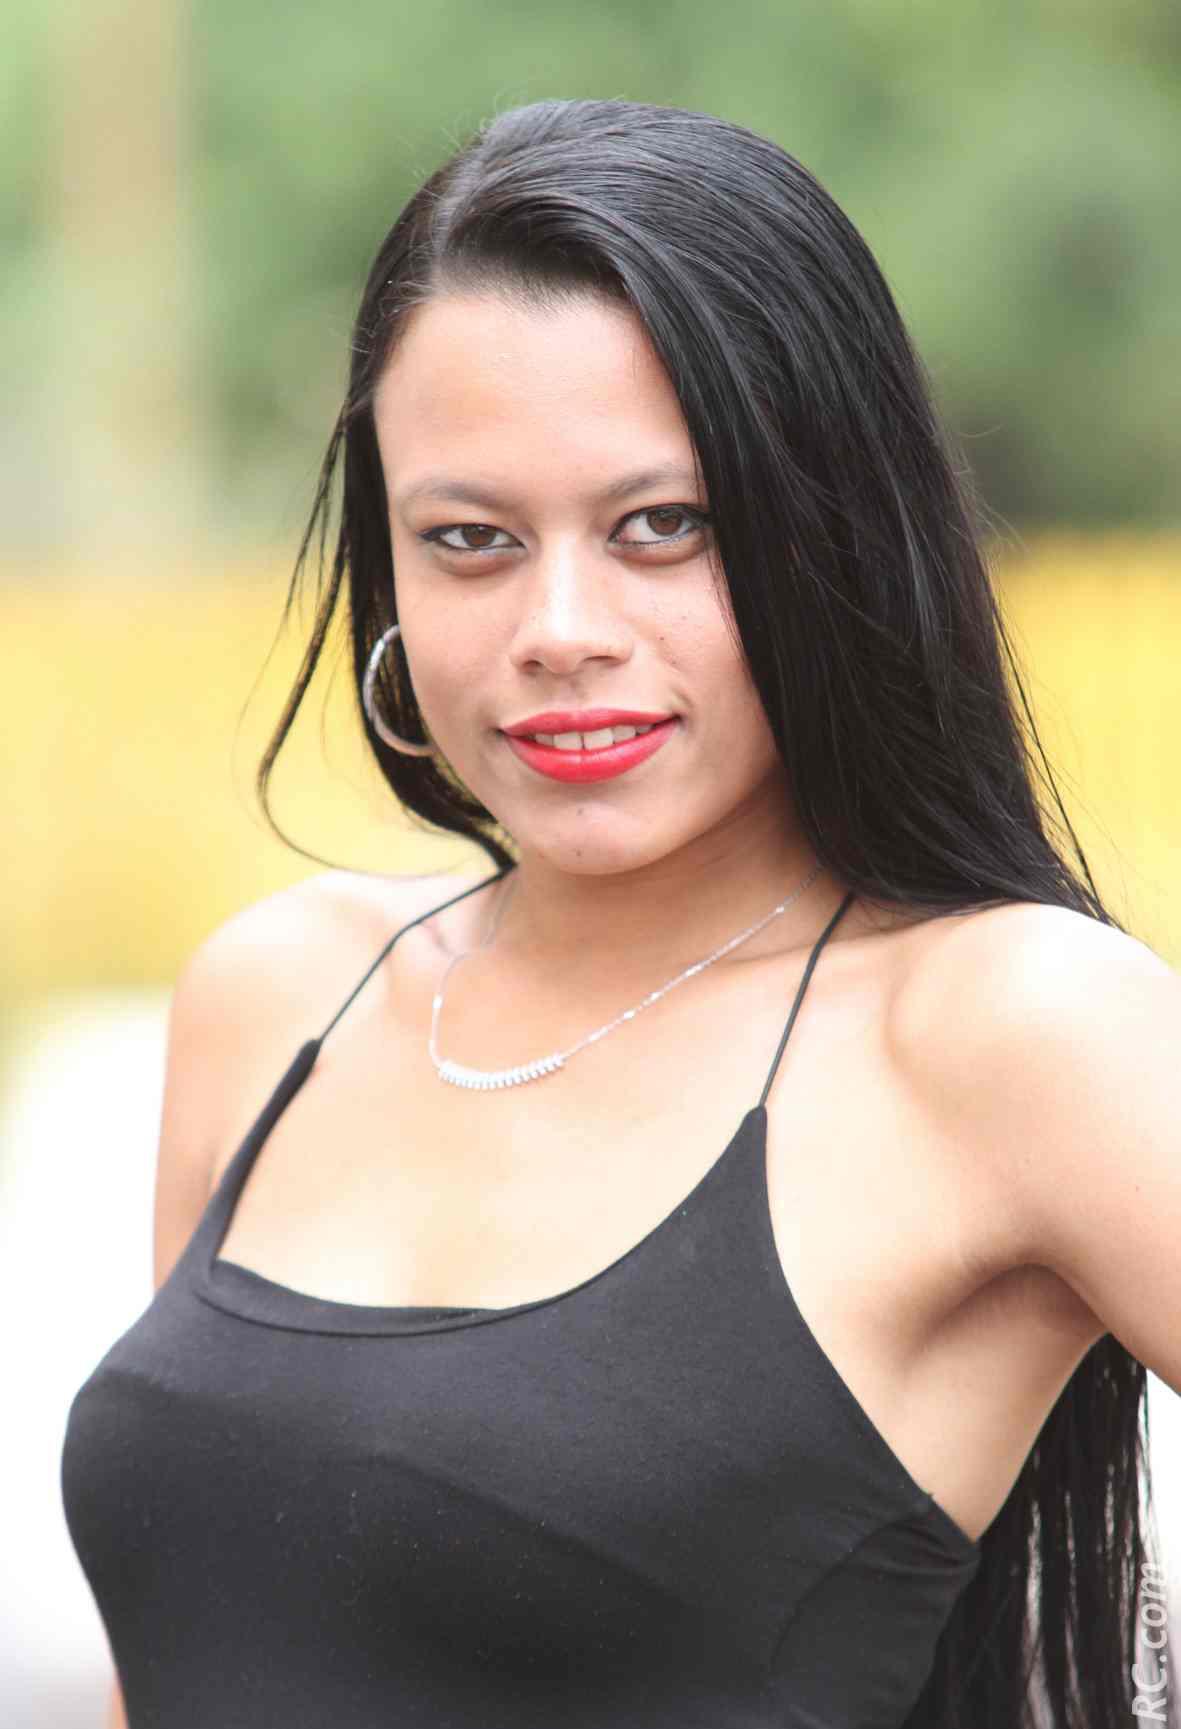 7. Elisa Payet